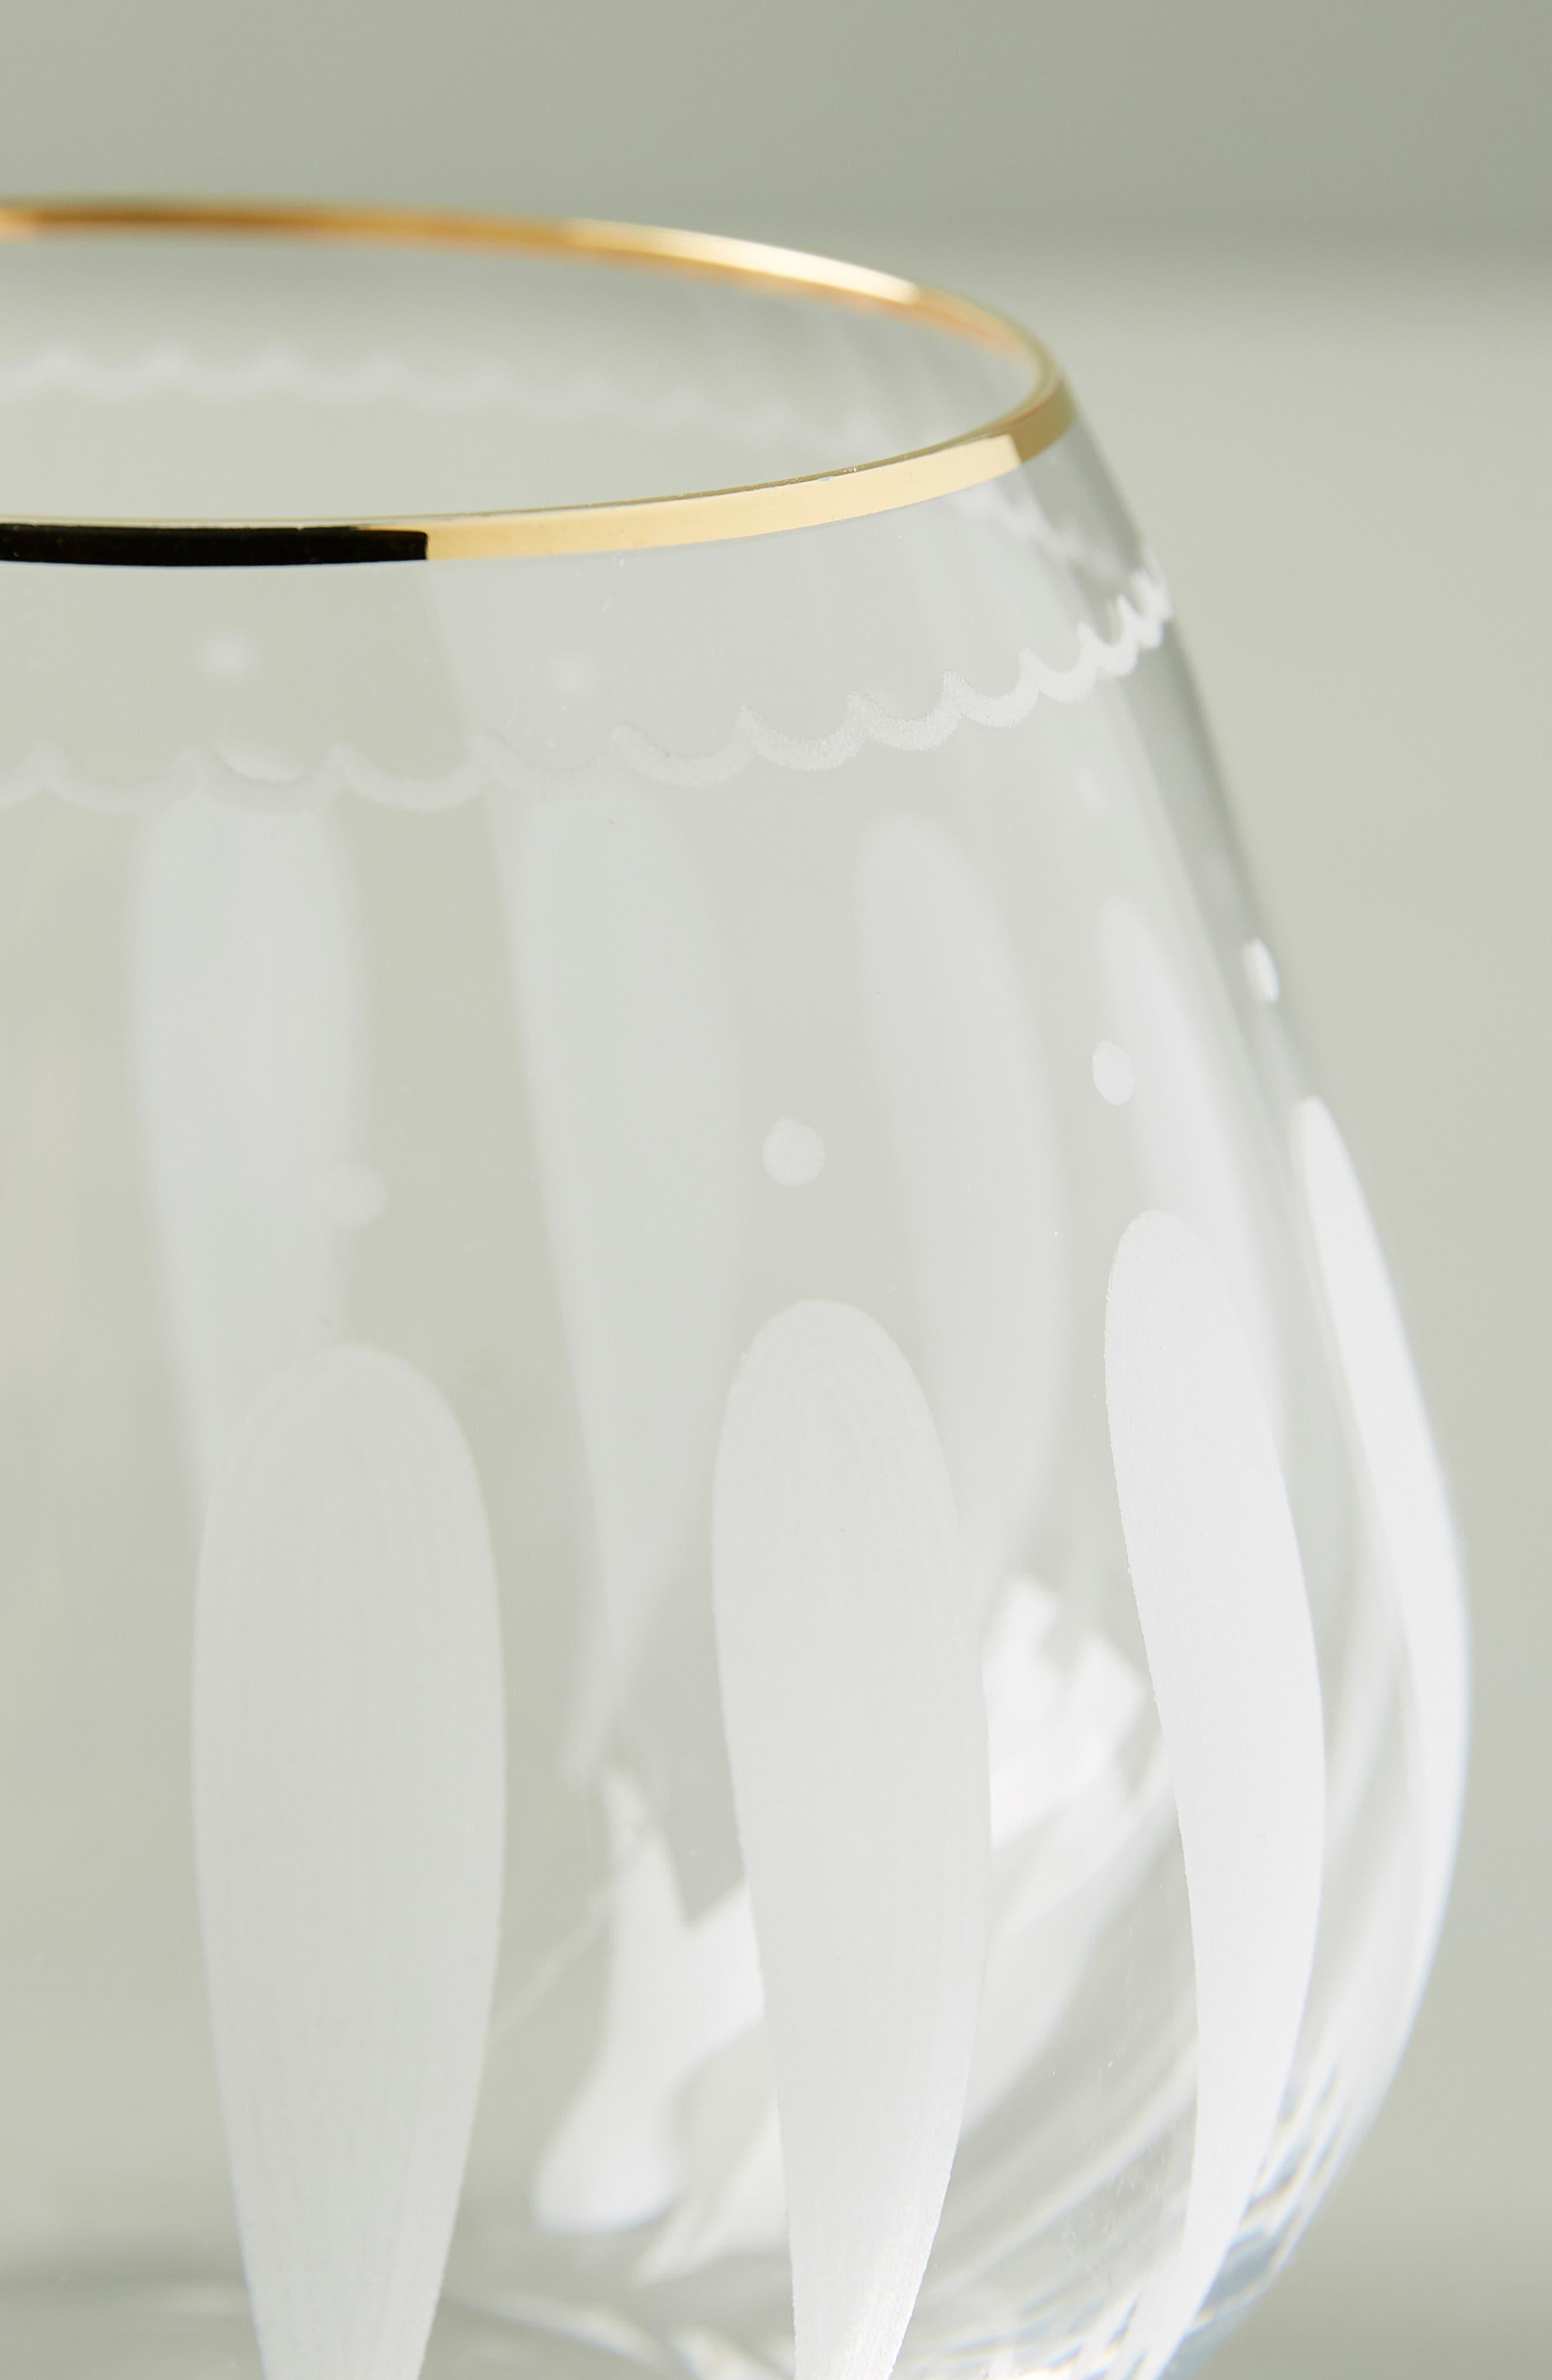 Odele Set of 4 Stemless Wine Glasses,                             Alternate thumbnail 2, color,                             CLEAR